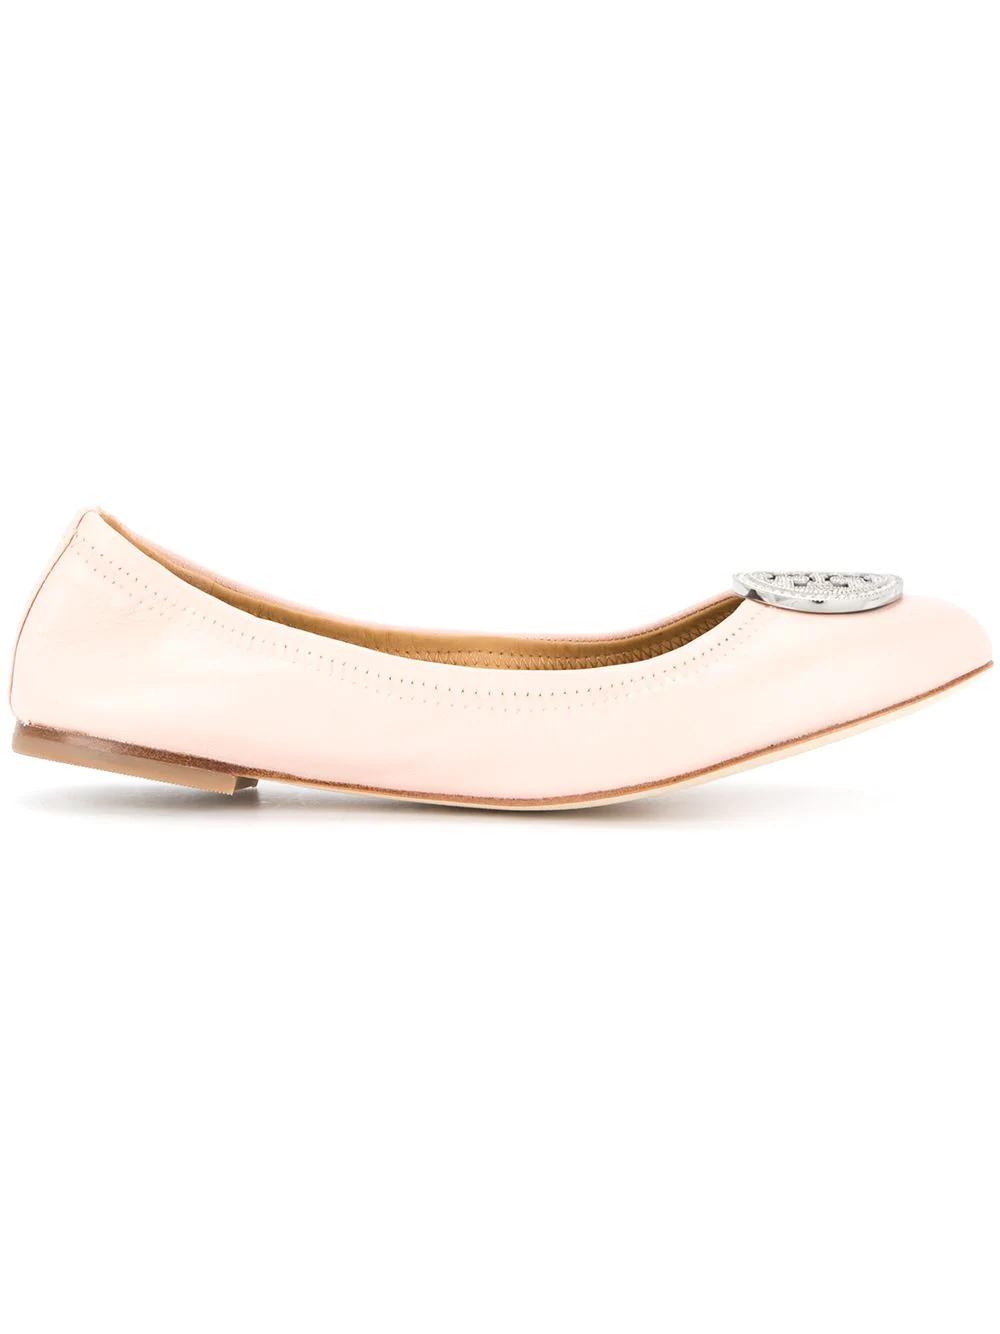 9f6bbc19fc69 Tory Burch Liana Ballerinas - Pink. Farfetch